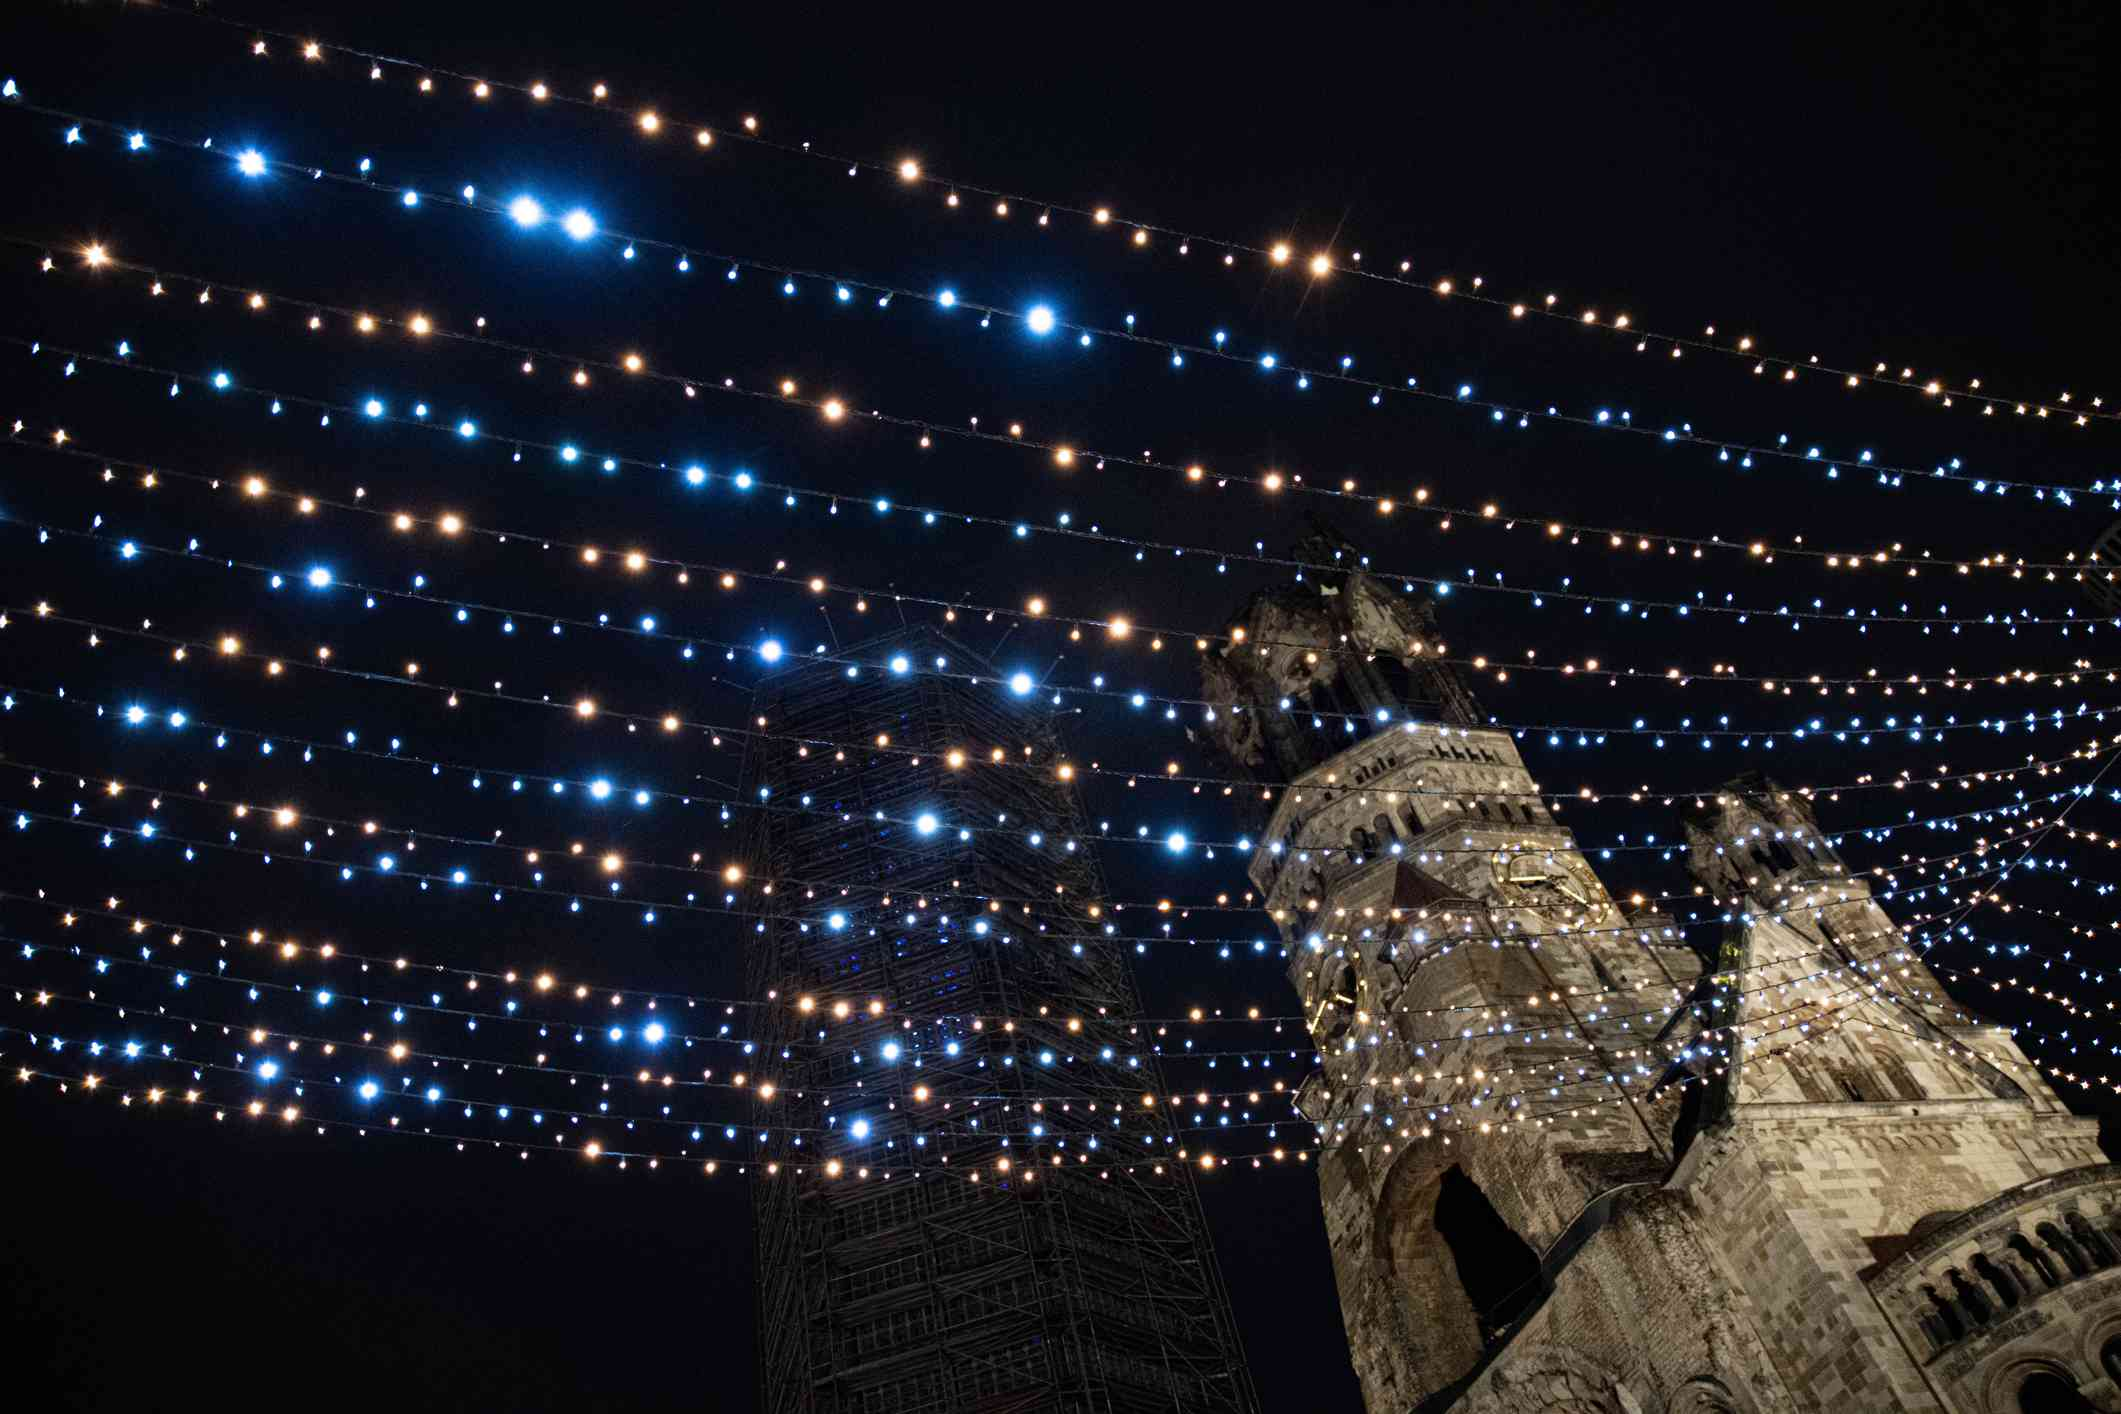 Rows of glowing golden and blue Christmas lights in night sky over blurry building silhouette of Kaiser Wilhelm church named Gedächtniskirche in German language. Cathedral on Breitscheidplatz in Berlin. Kaiser Wilhelm memorial church